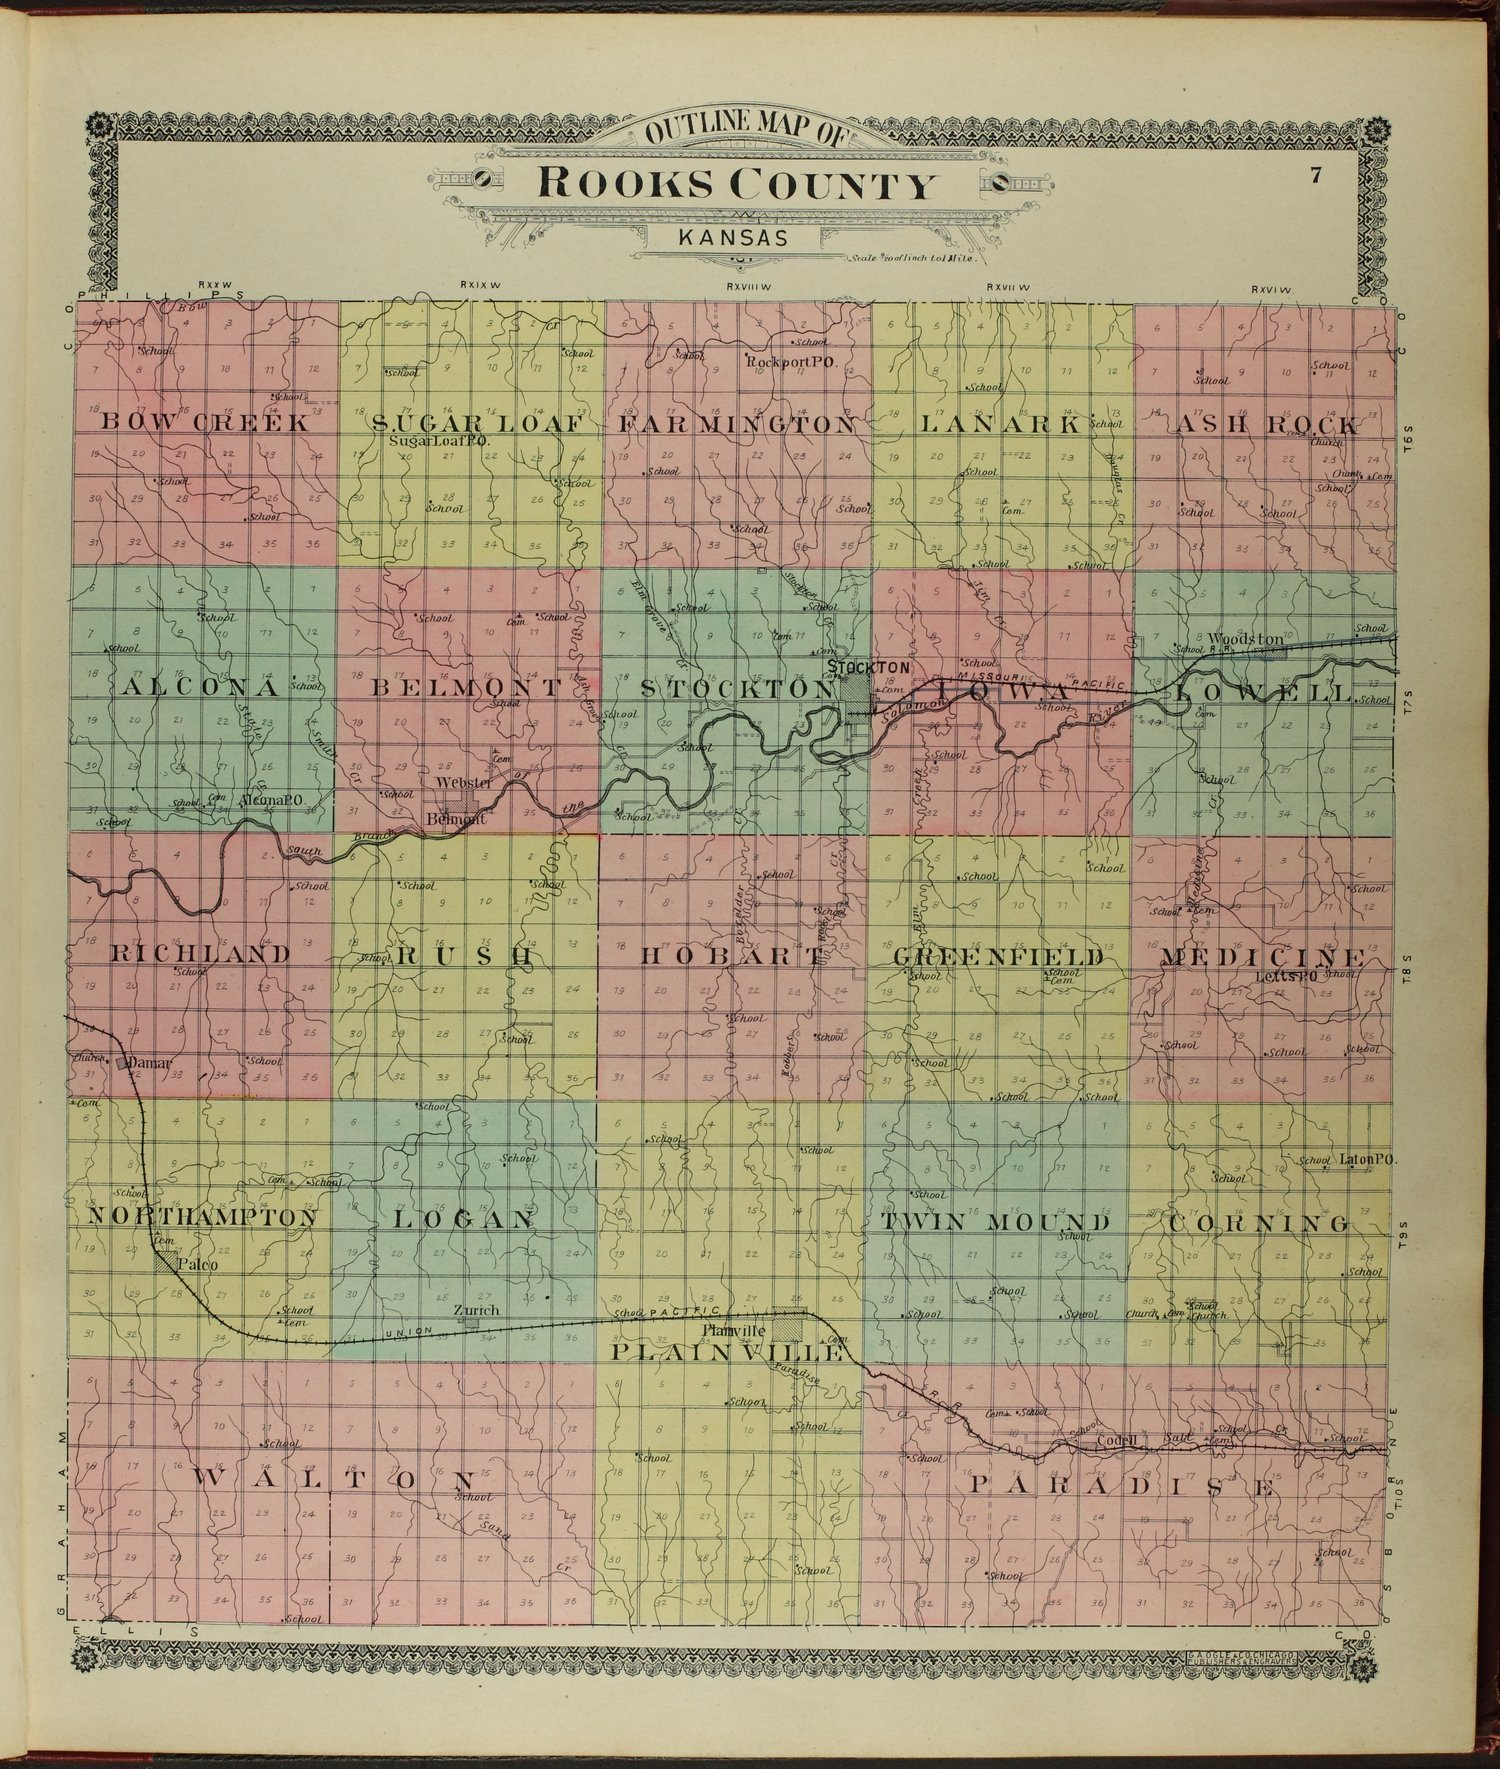 Standard atlas of Rooks County, Kansas - 7